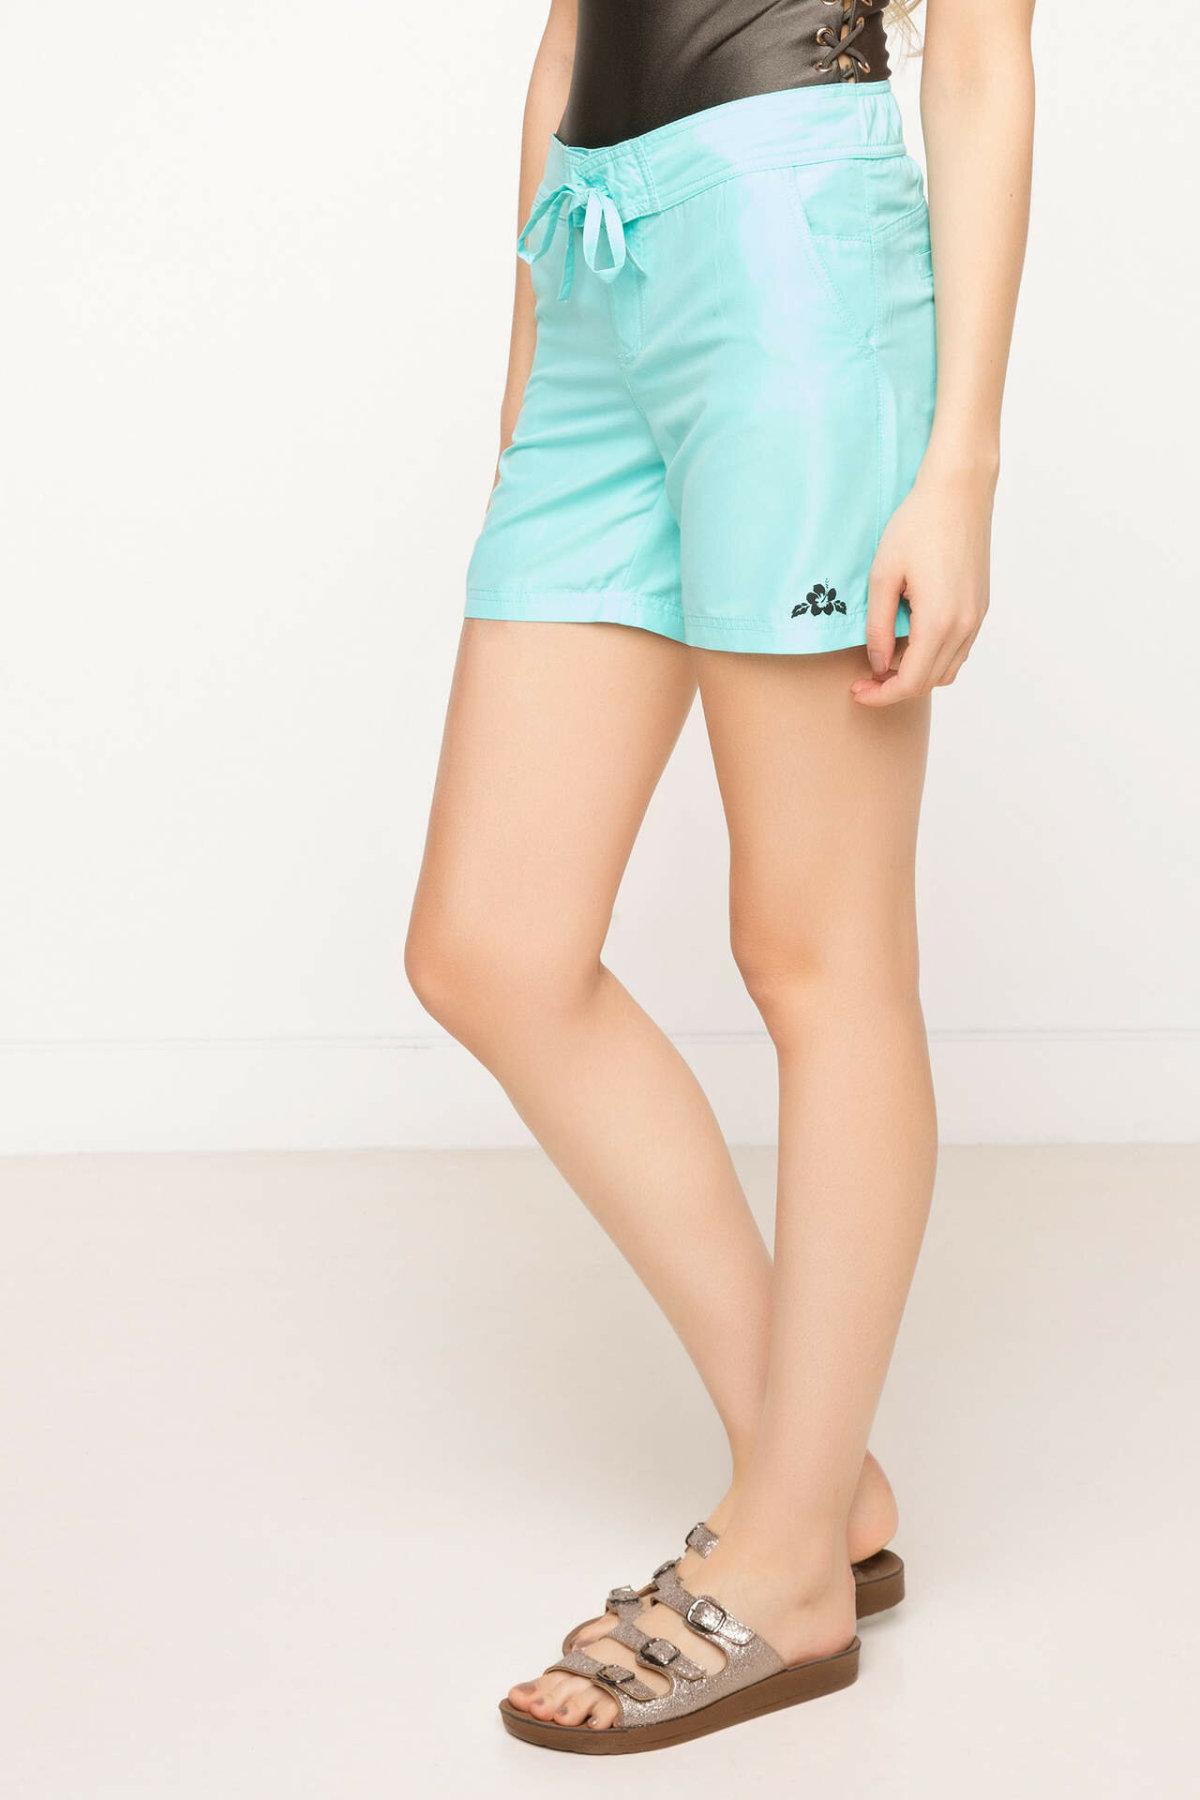 DeFacto Summer Woman Woven Swimming Short Female Casual Drawstring Shorts Ladies Pure Color Comfort Short Pants - G8560AZ17SM